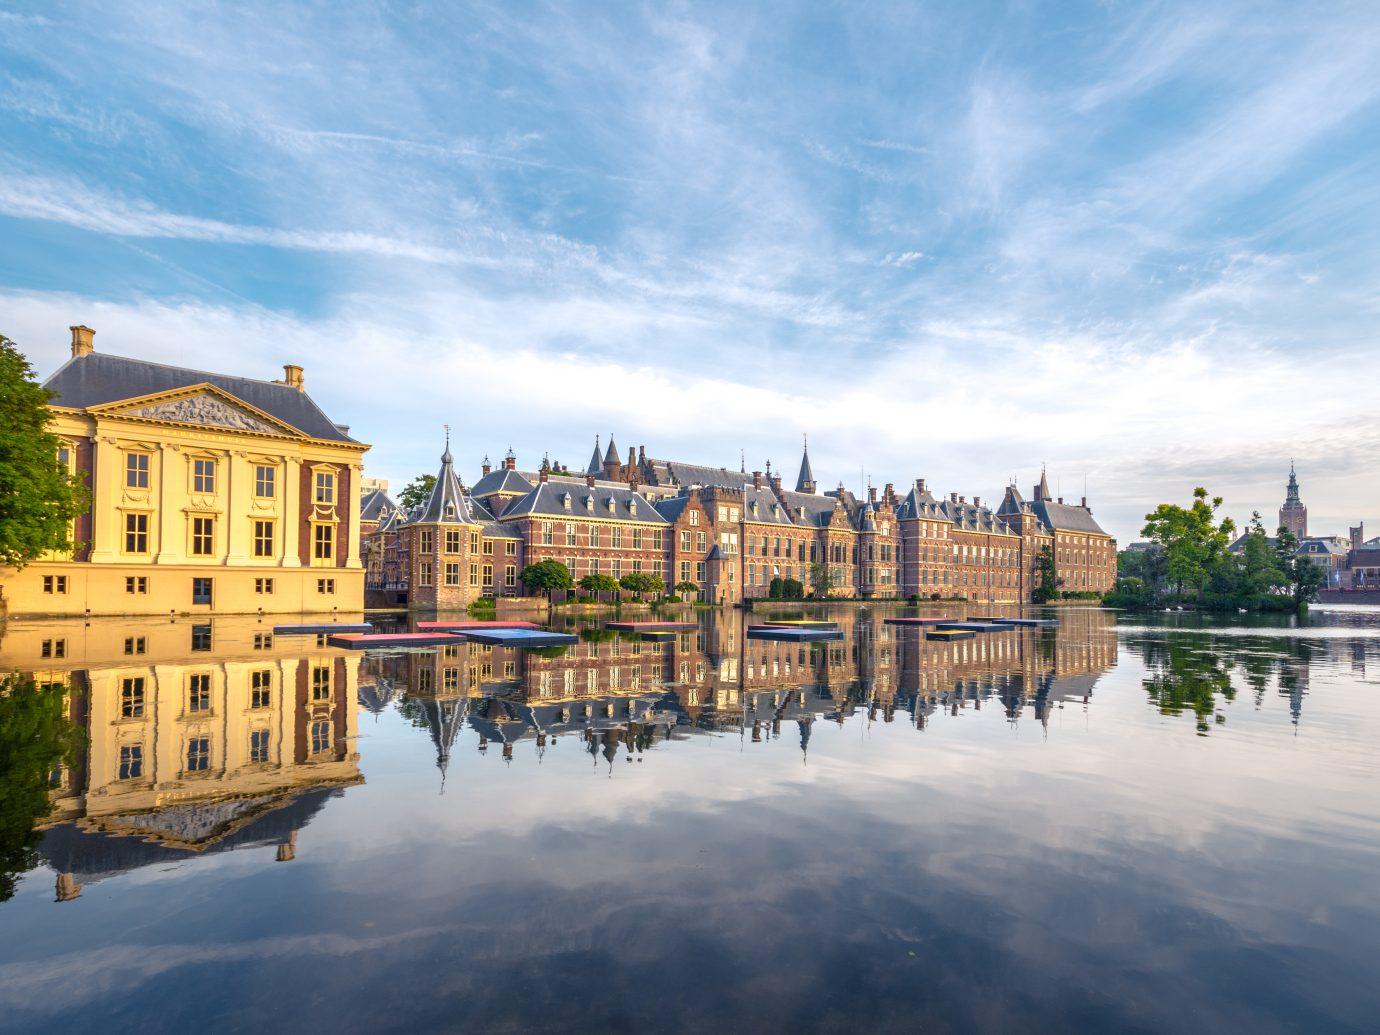 The Hofvijver Pond in The Hague, Netherlands